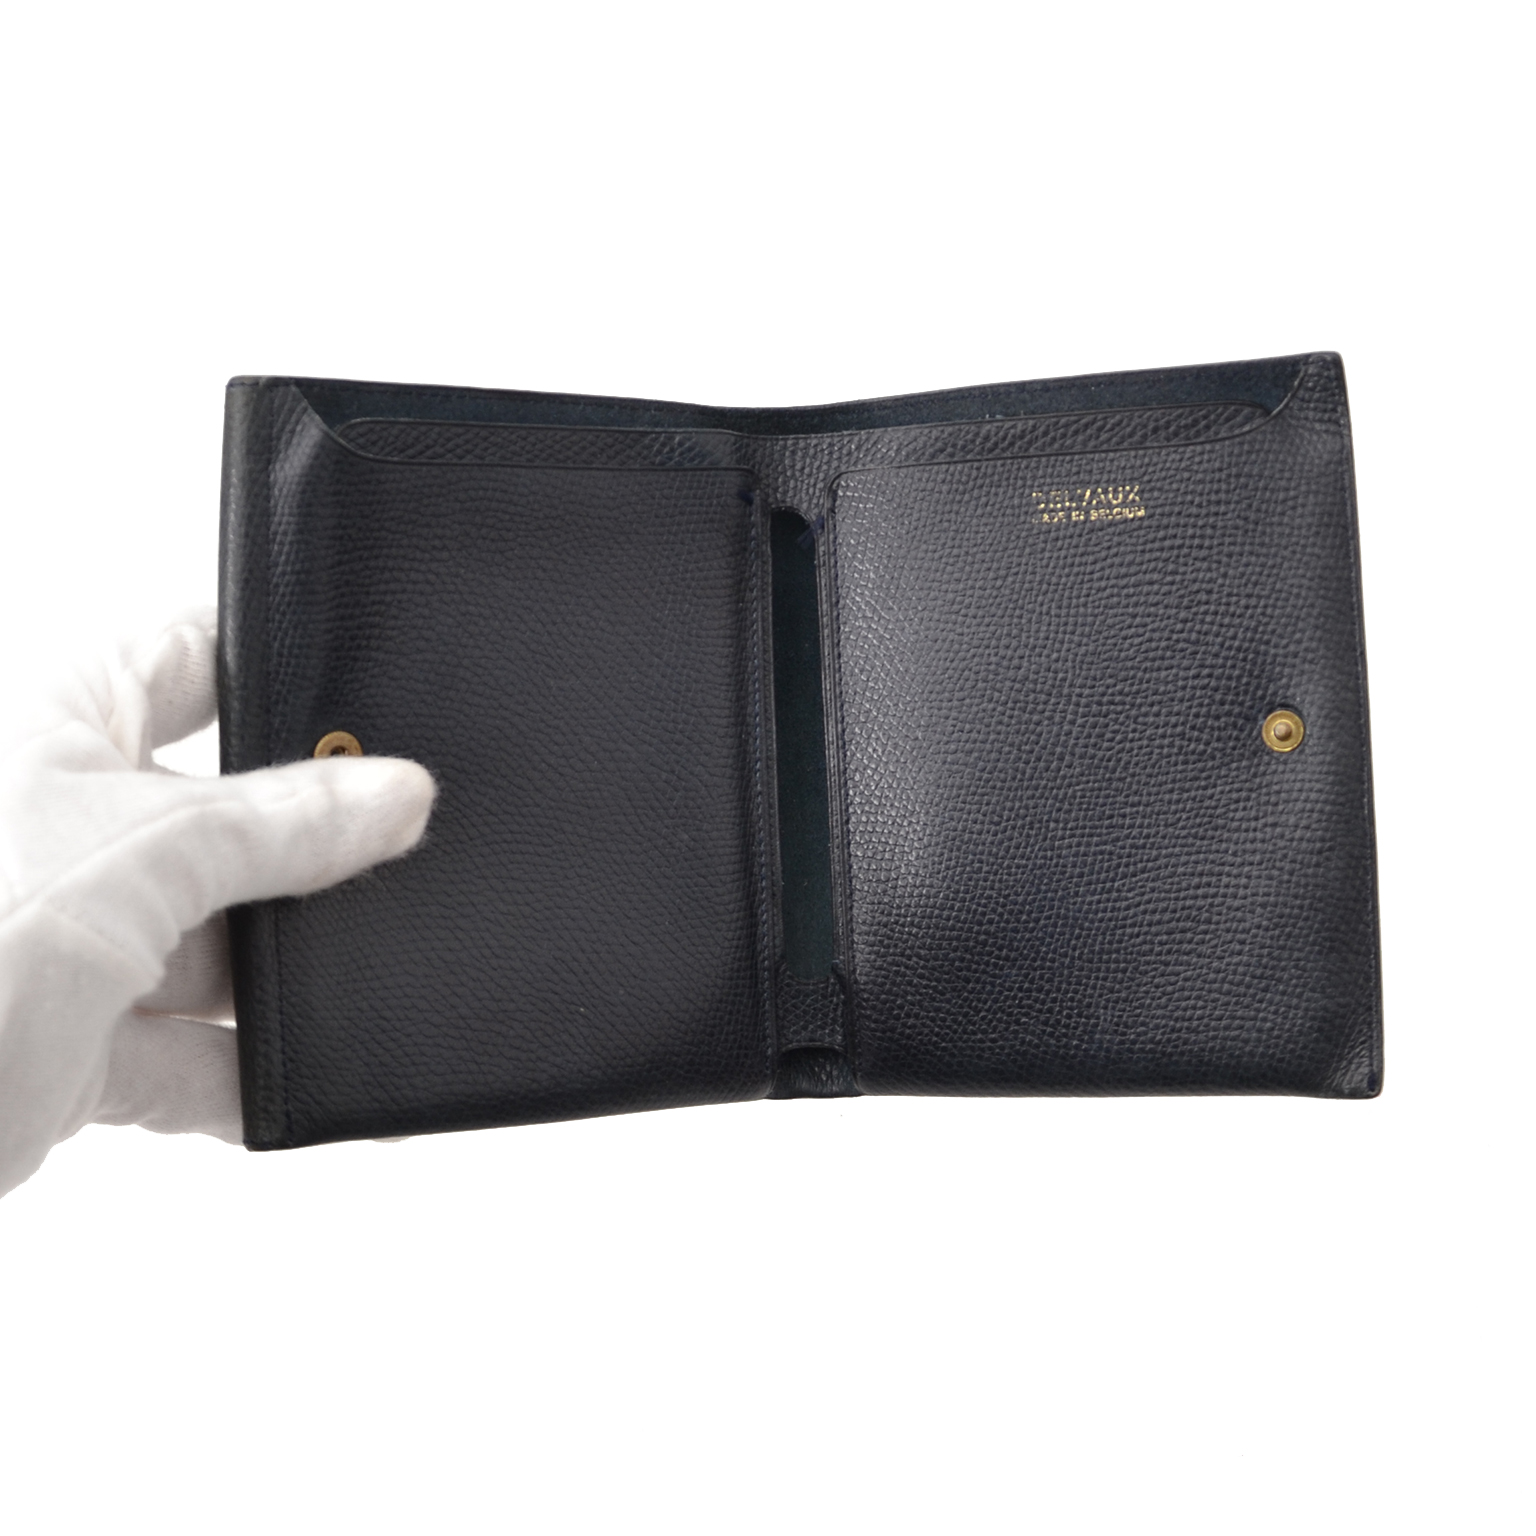 Acheter en ligne chez Labellov.com Delvaux Dark Blue Wallet